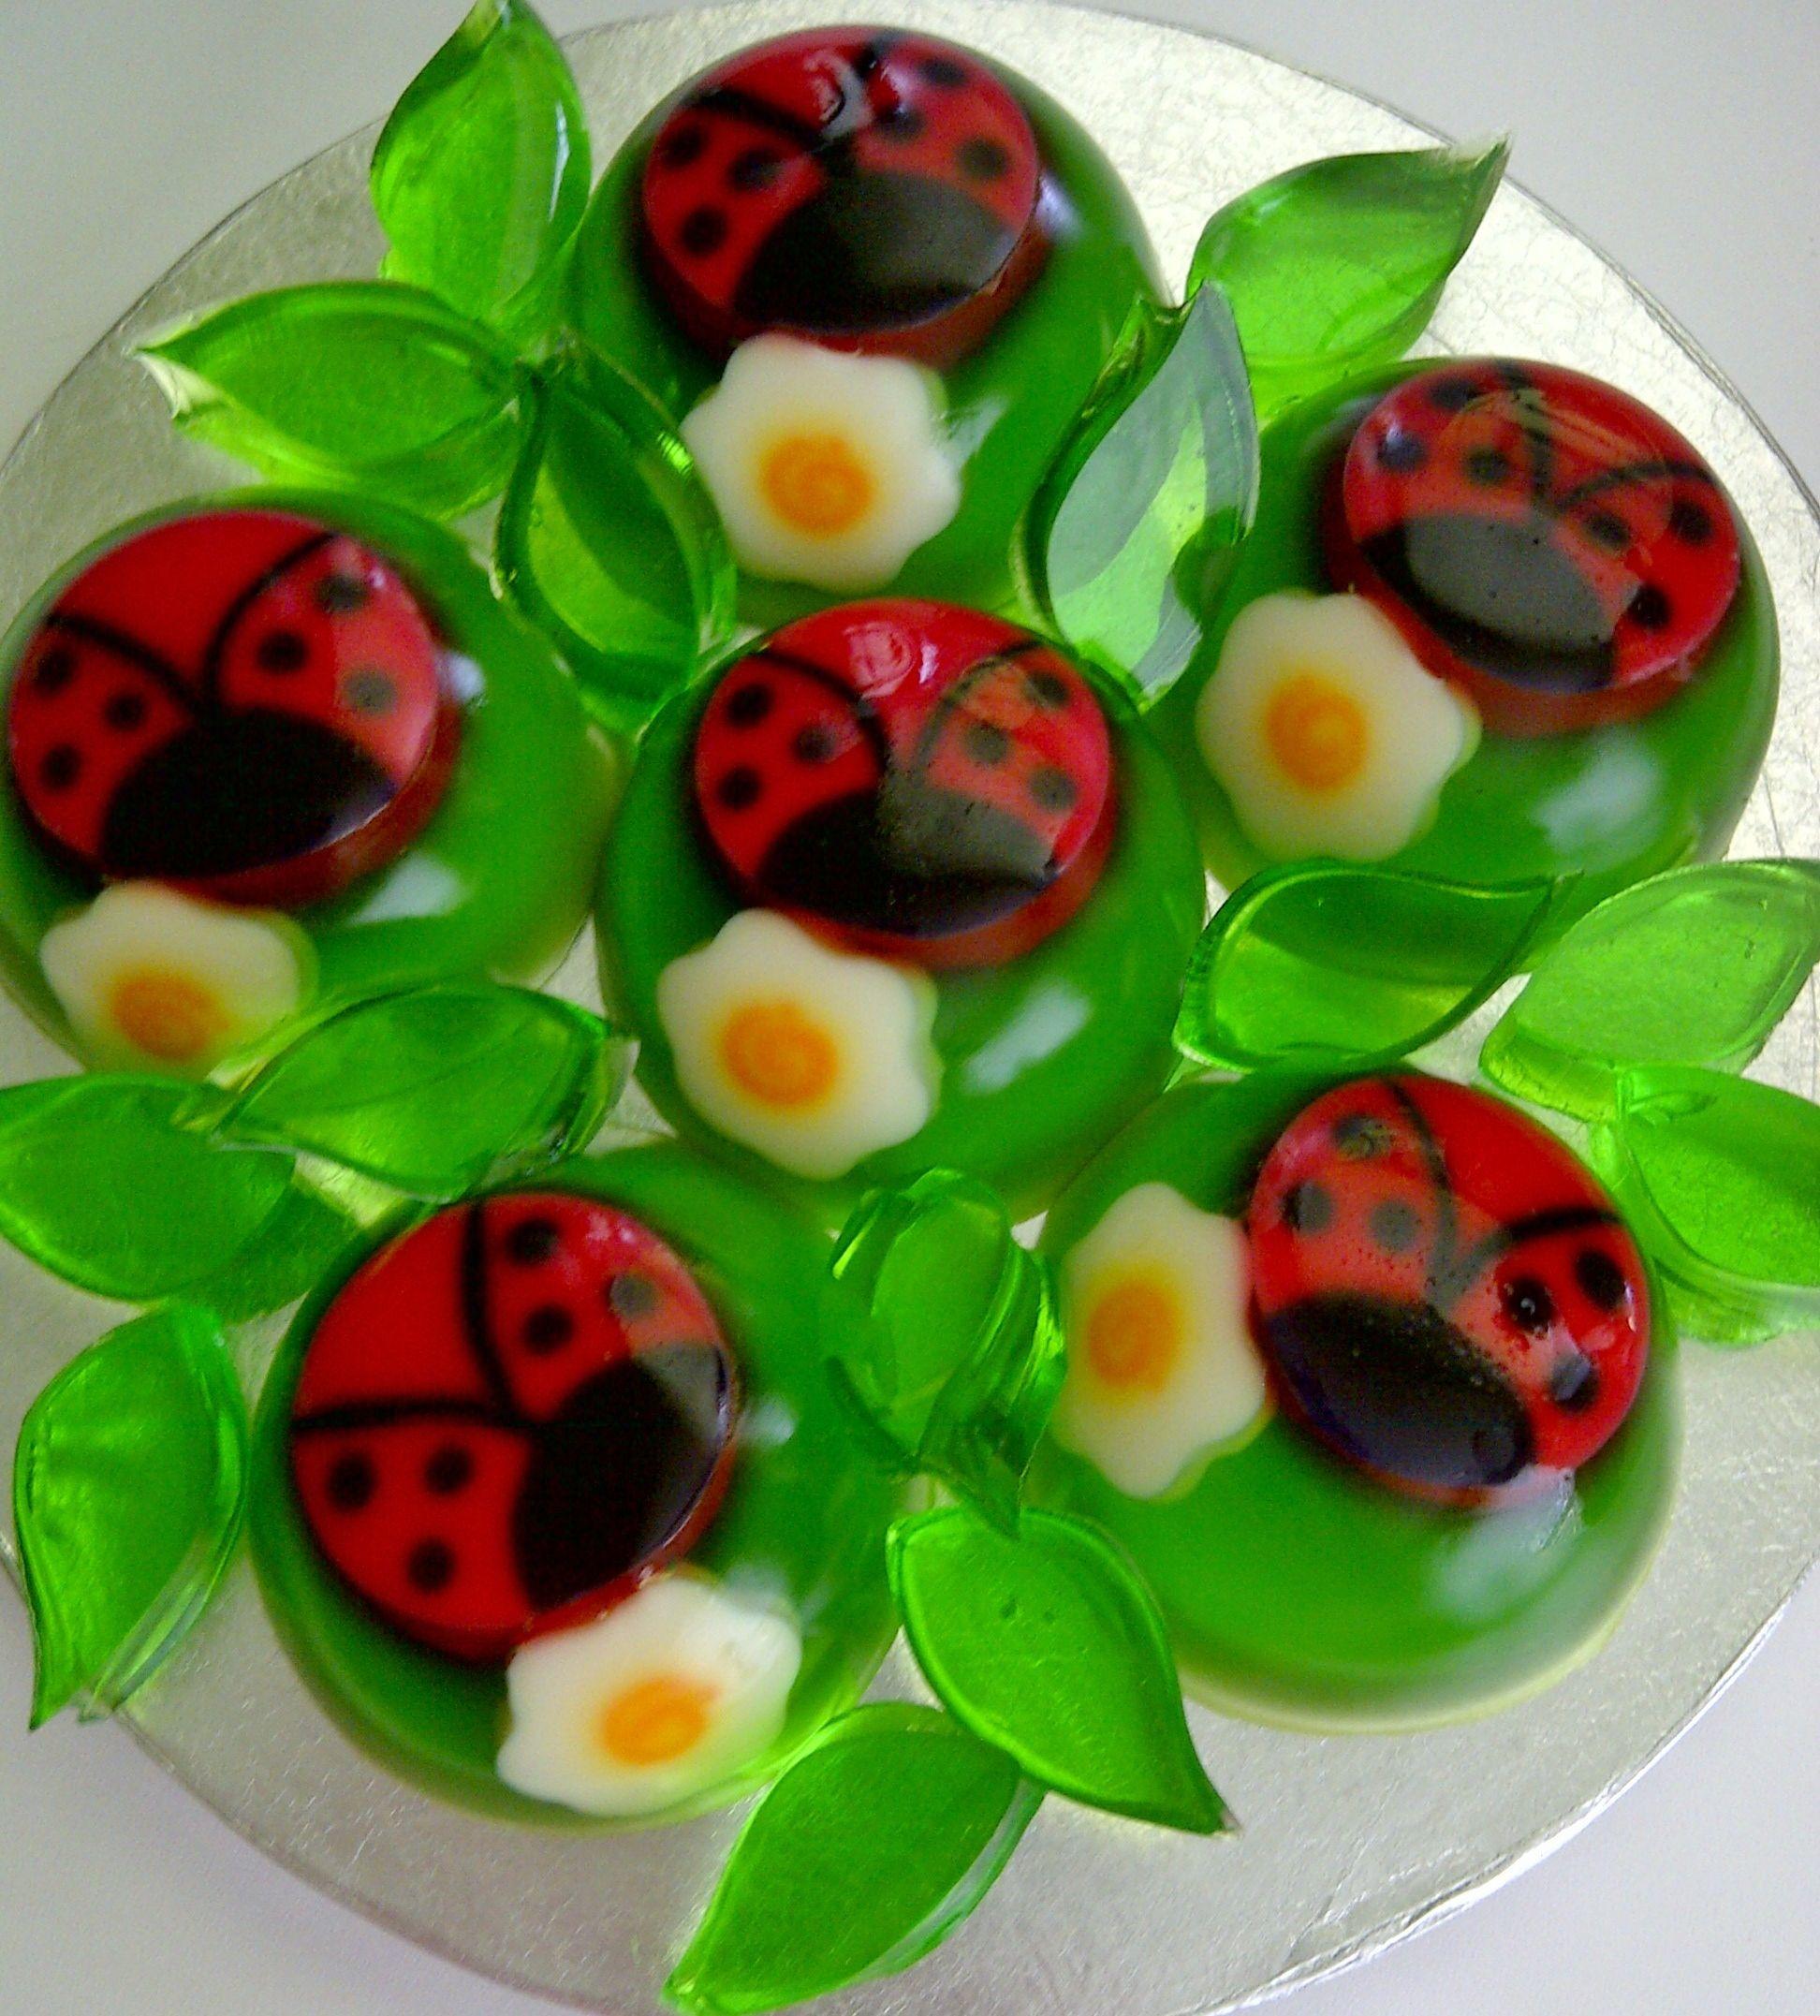 gelatina criativa ladybug